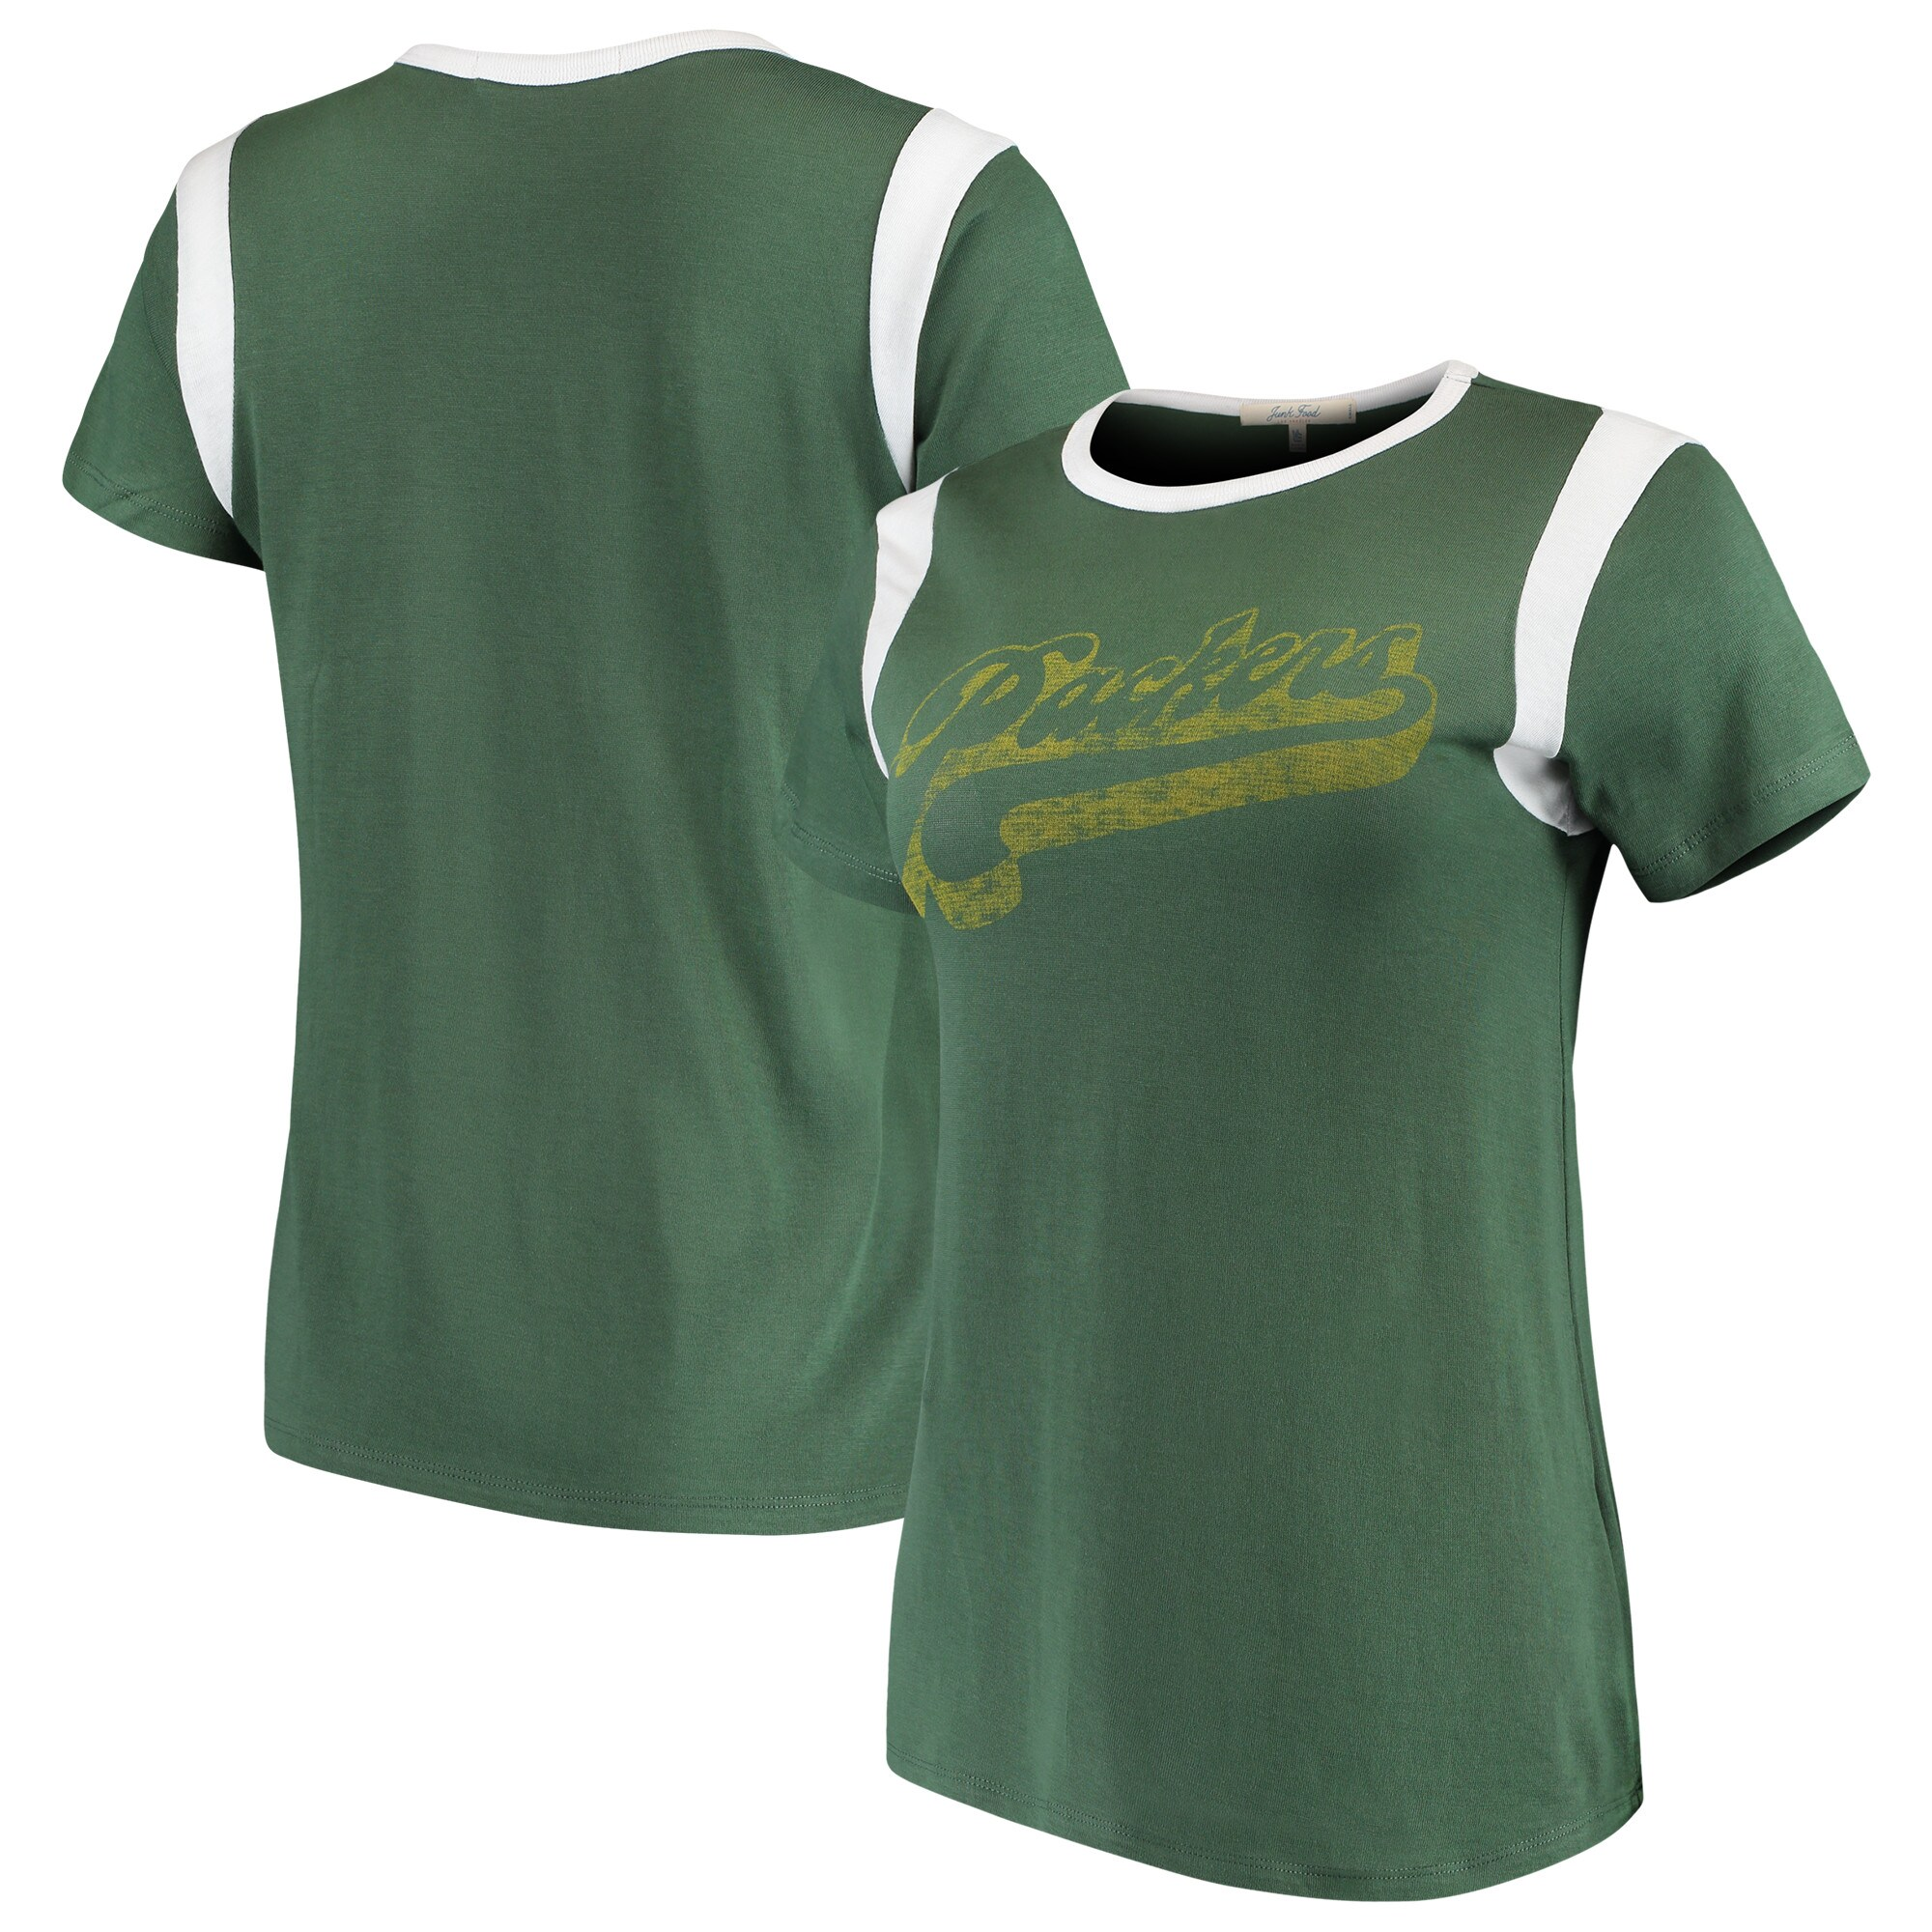 Green Bay Packers Junk Food Women's Retro Sport T-Shirt - Green/White